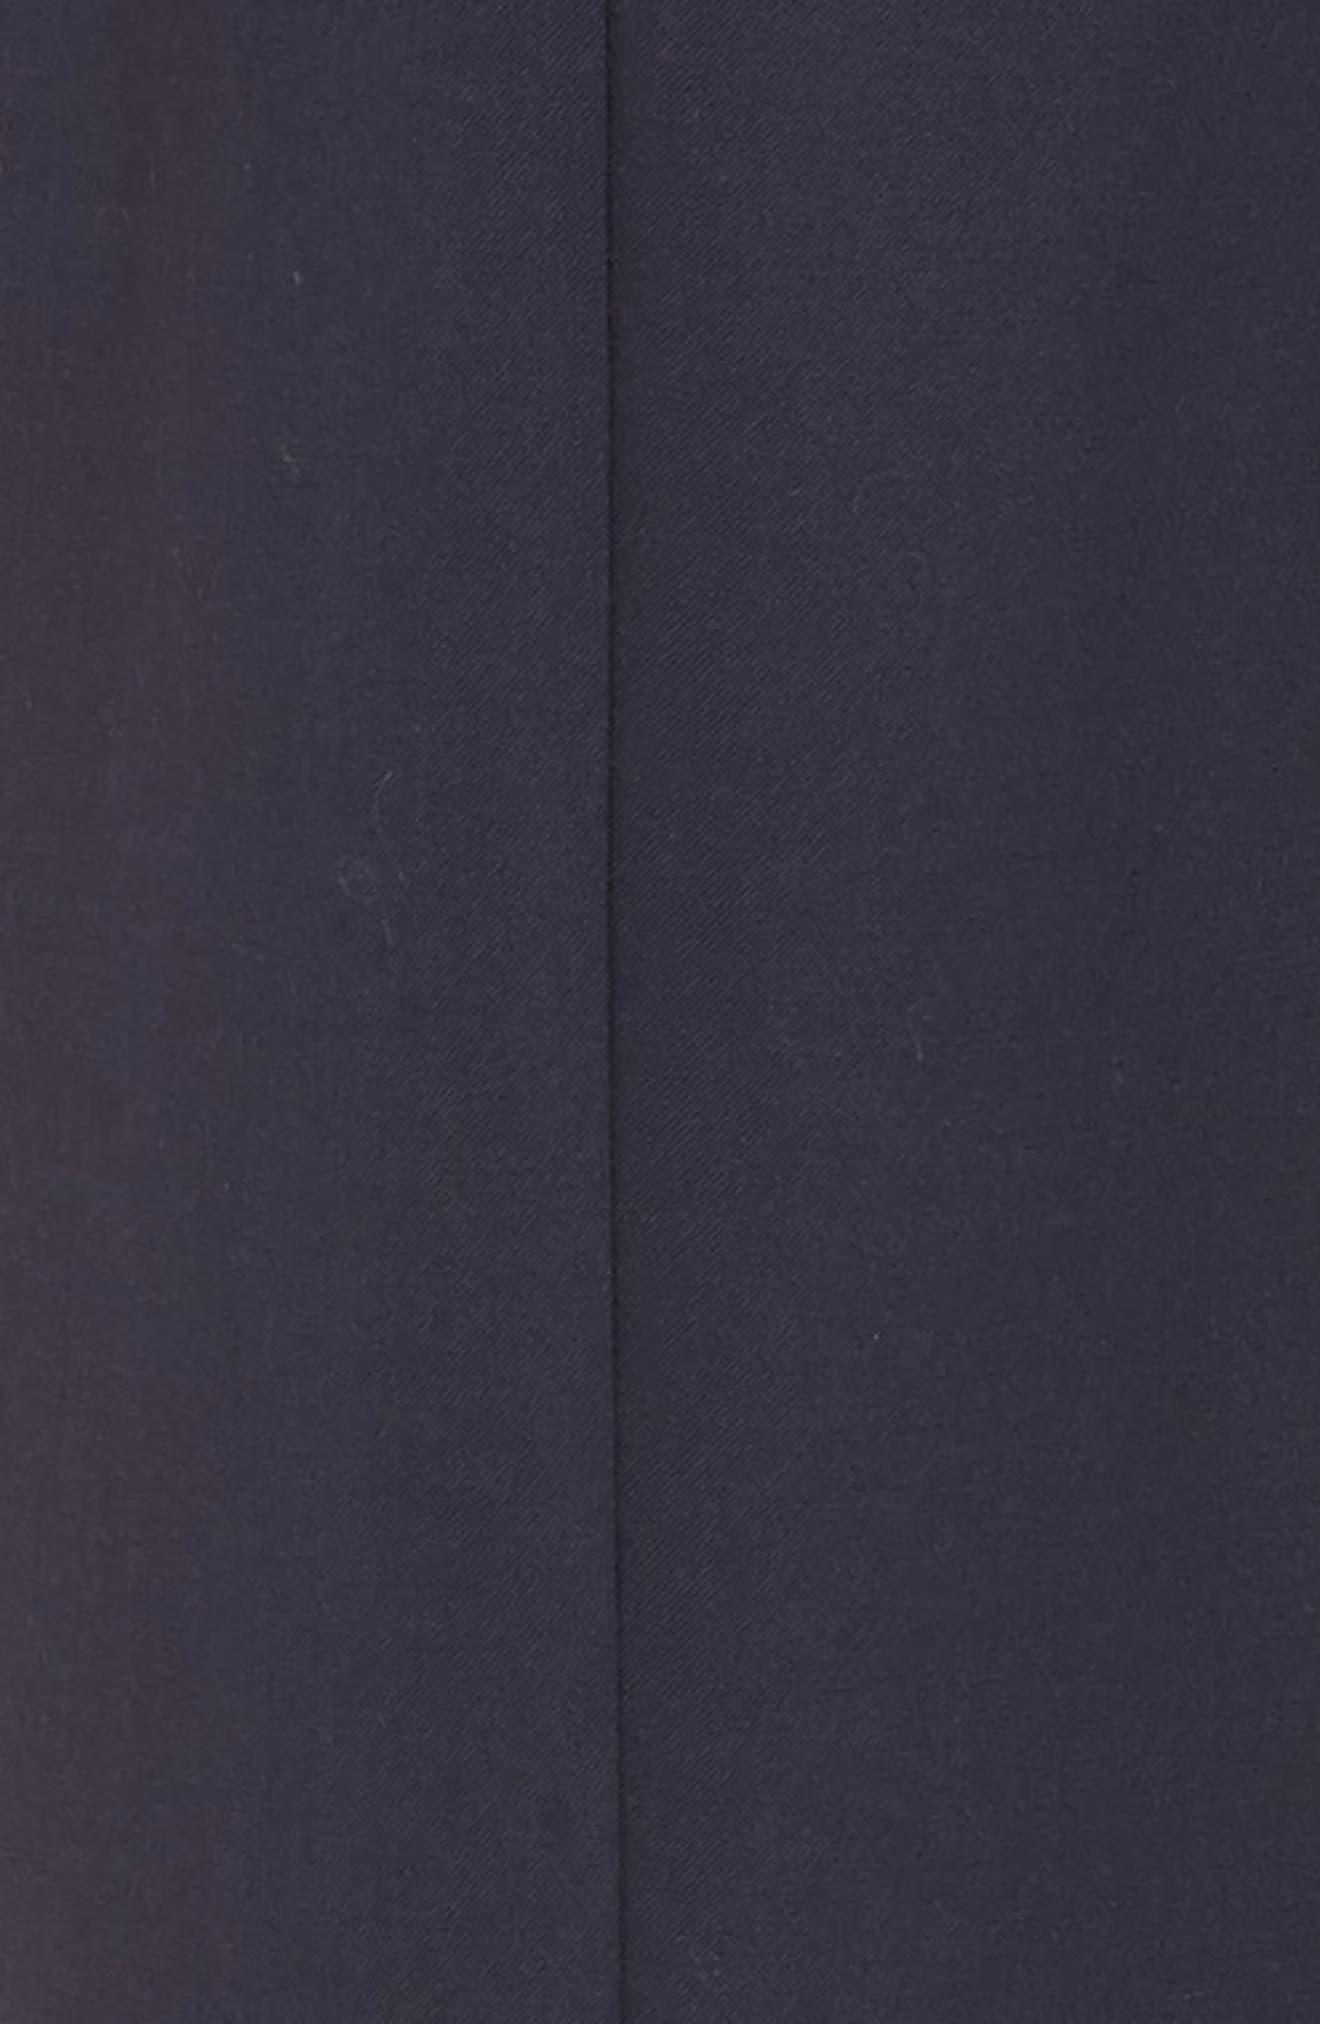 Button Detail Wide Leg Trouser,                             Alternate thumbnail 5, color,                             Navy Night